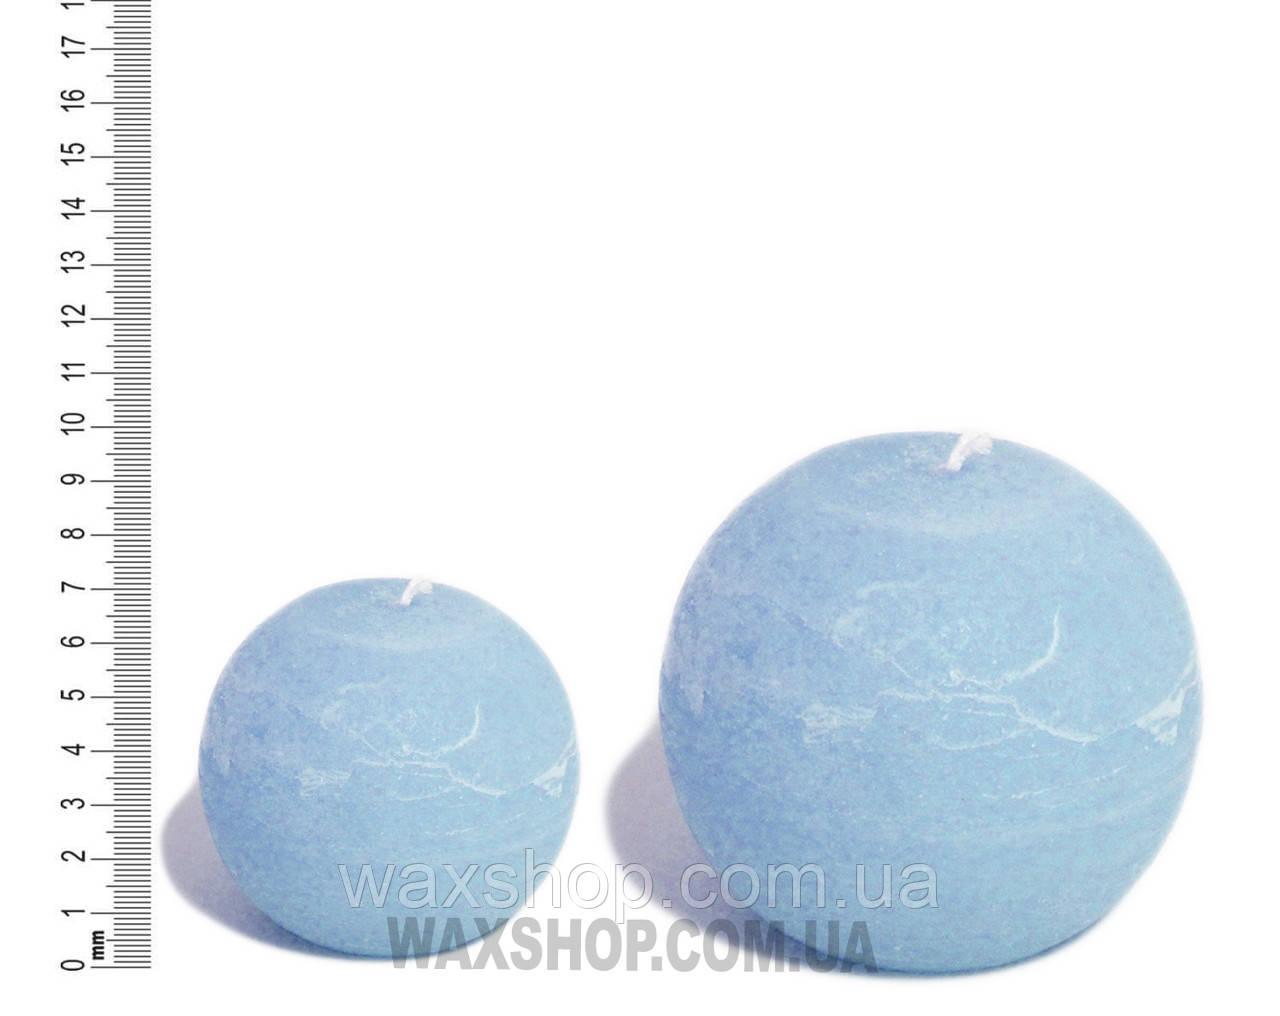 Свеча шар 7 см Голубой